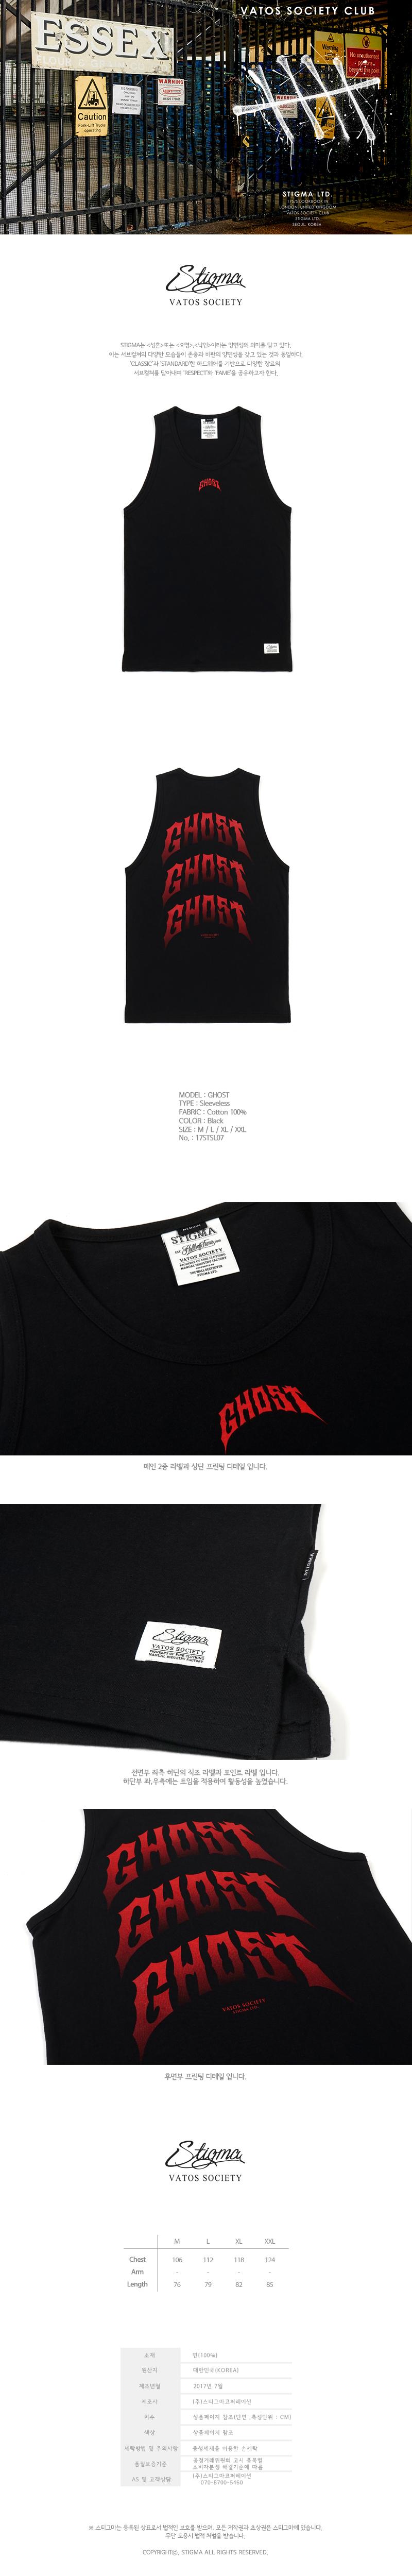 GHOST SLEEVELESS BLACK32,000원-스티그마패션의류, 남성상의, 티셔츠, 나시/민소매티셔츠바보사랑GHOST SLEEVELESS BLACK32,000원-스티그마패션의류, 남성상의, 티셔츠, 나시/민소매티셔츠바보사랑